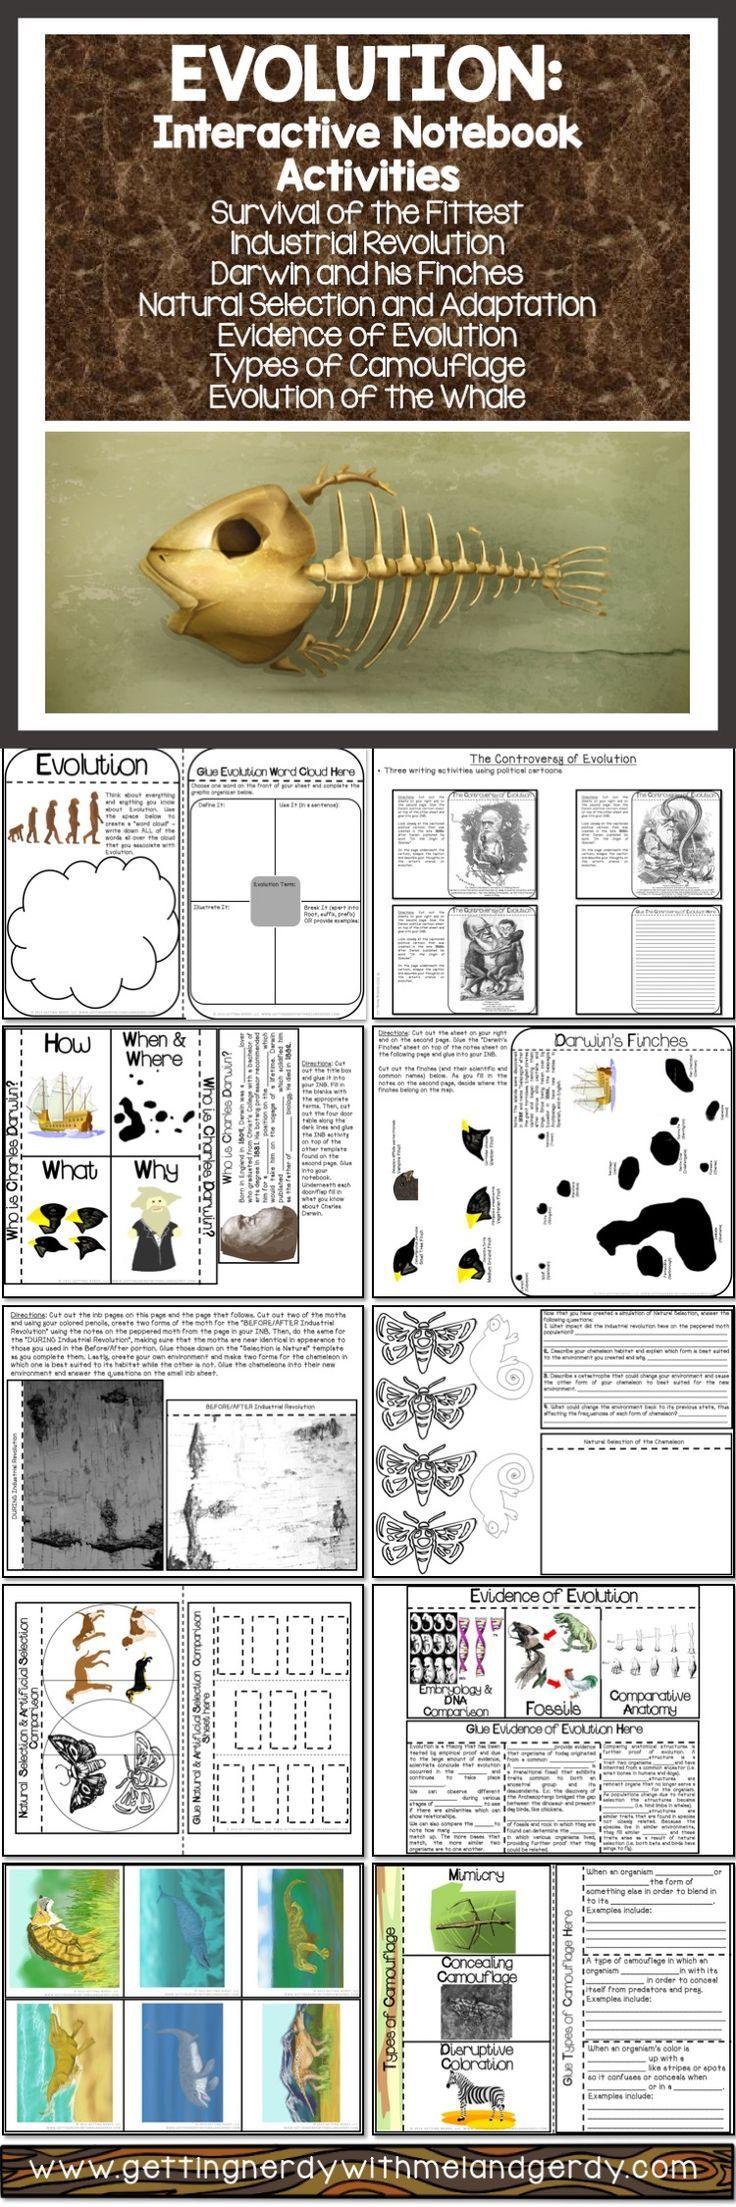 peppered moth simulation answer key pdf